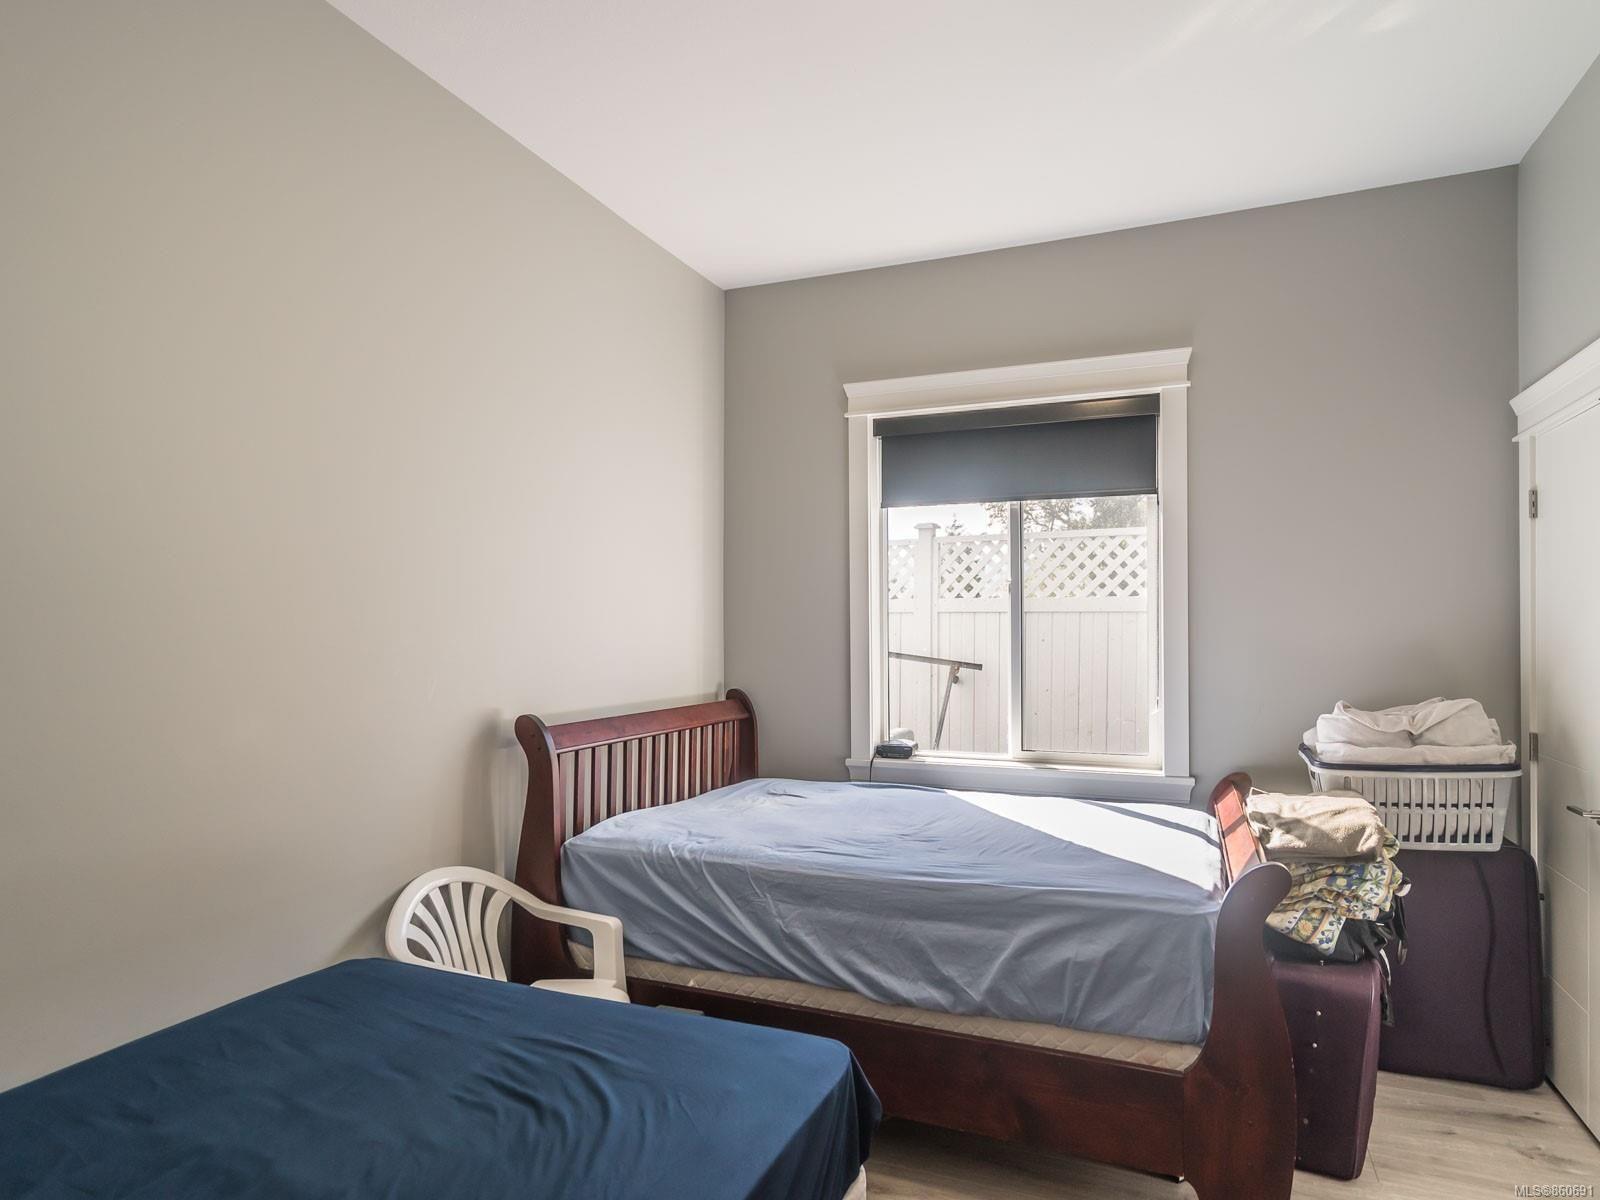 Photo 44: Photos: 5821 Linley Valley Dr in : Na North Nanaimo House for sale (Nanaimo)  : MLS®# 860691